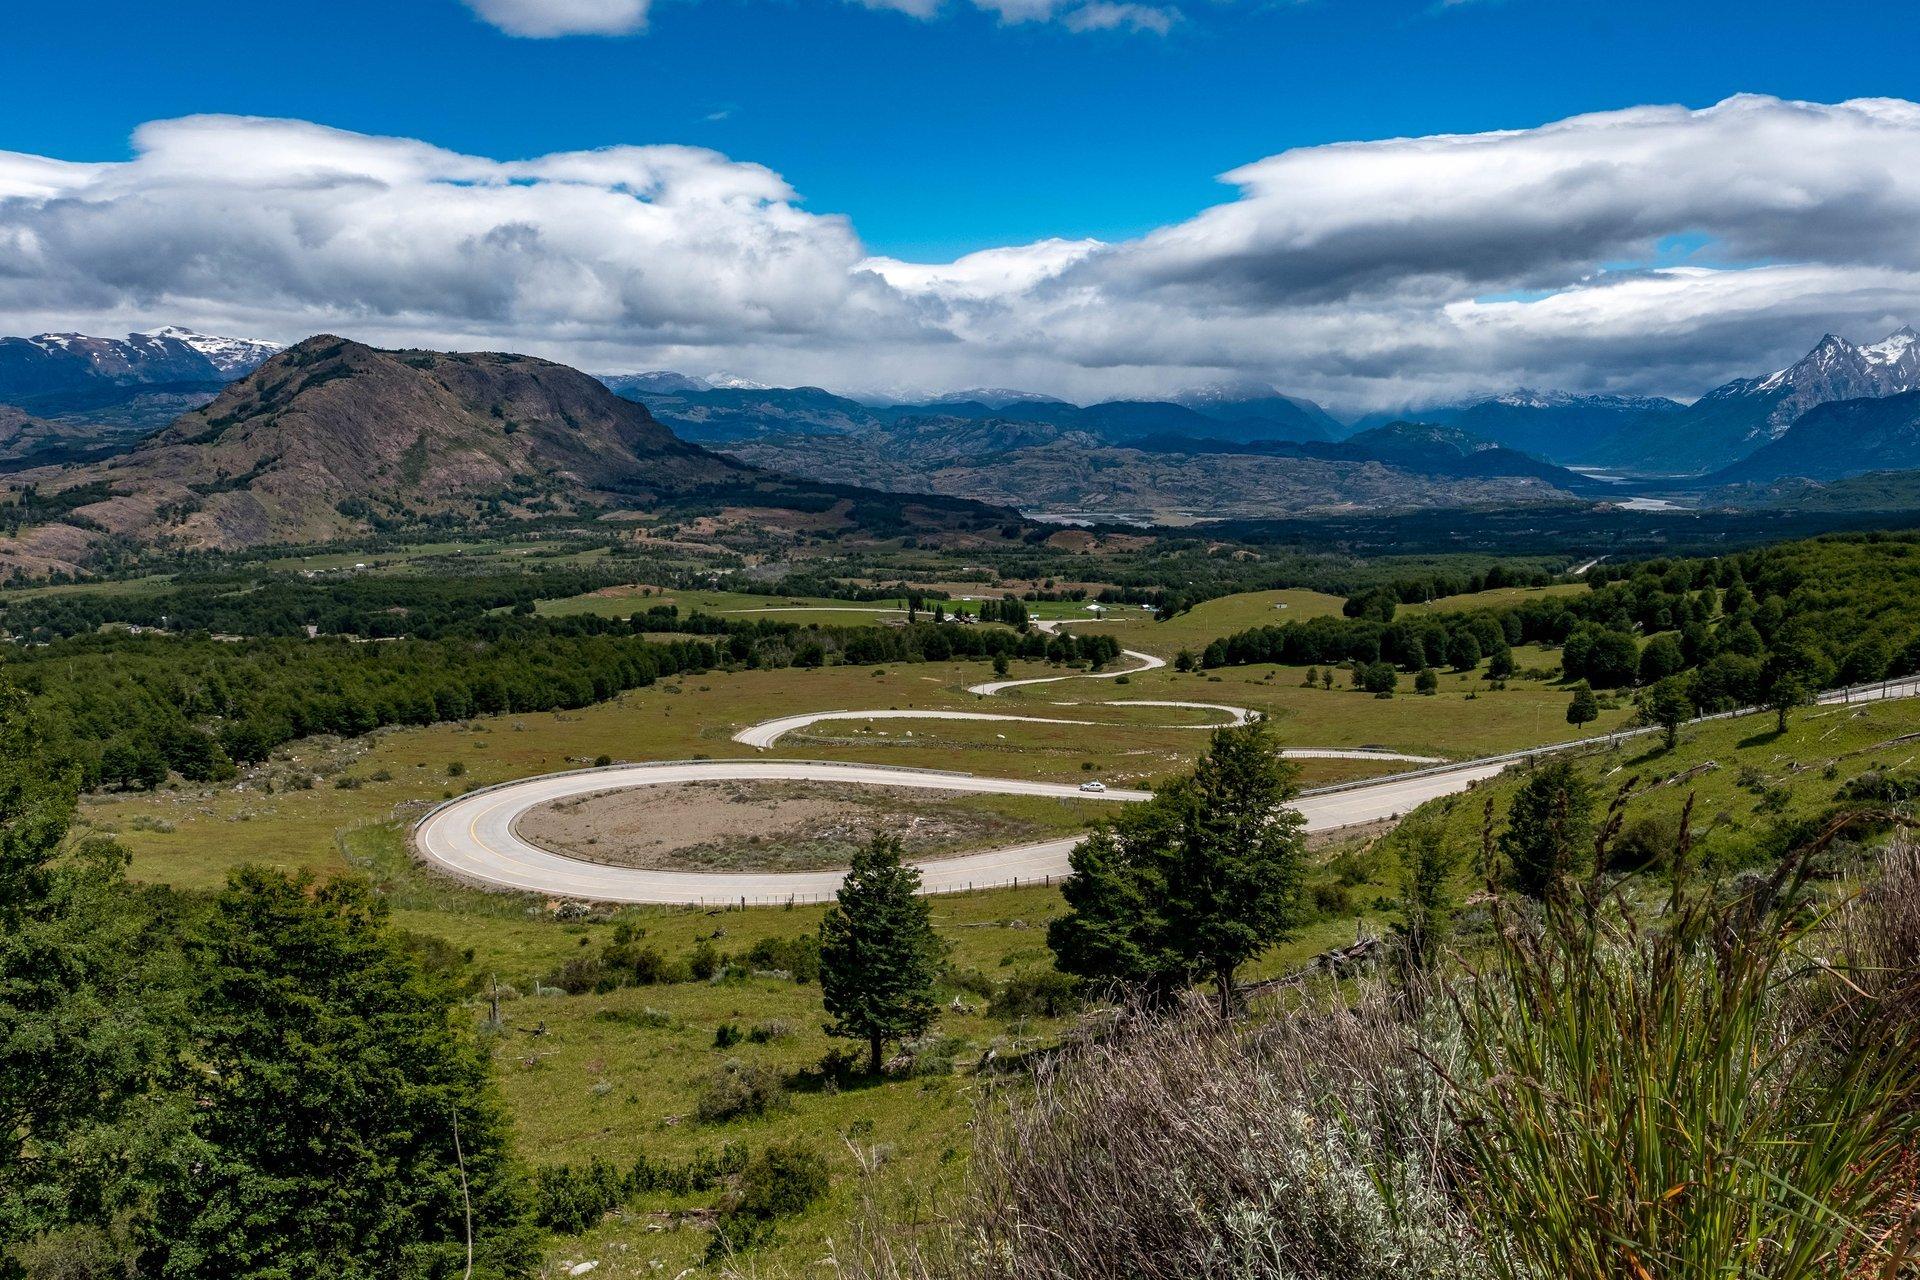 Carretera Austral in Patagonia 2020 - Best Time